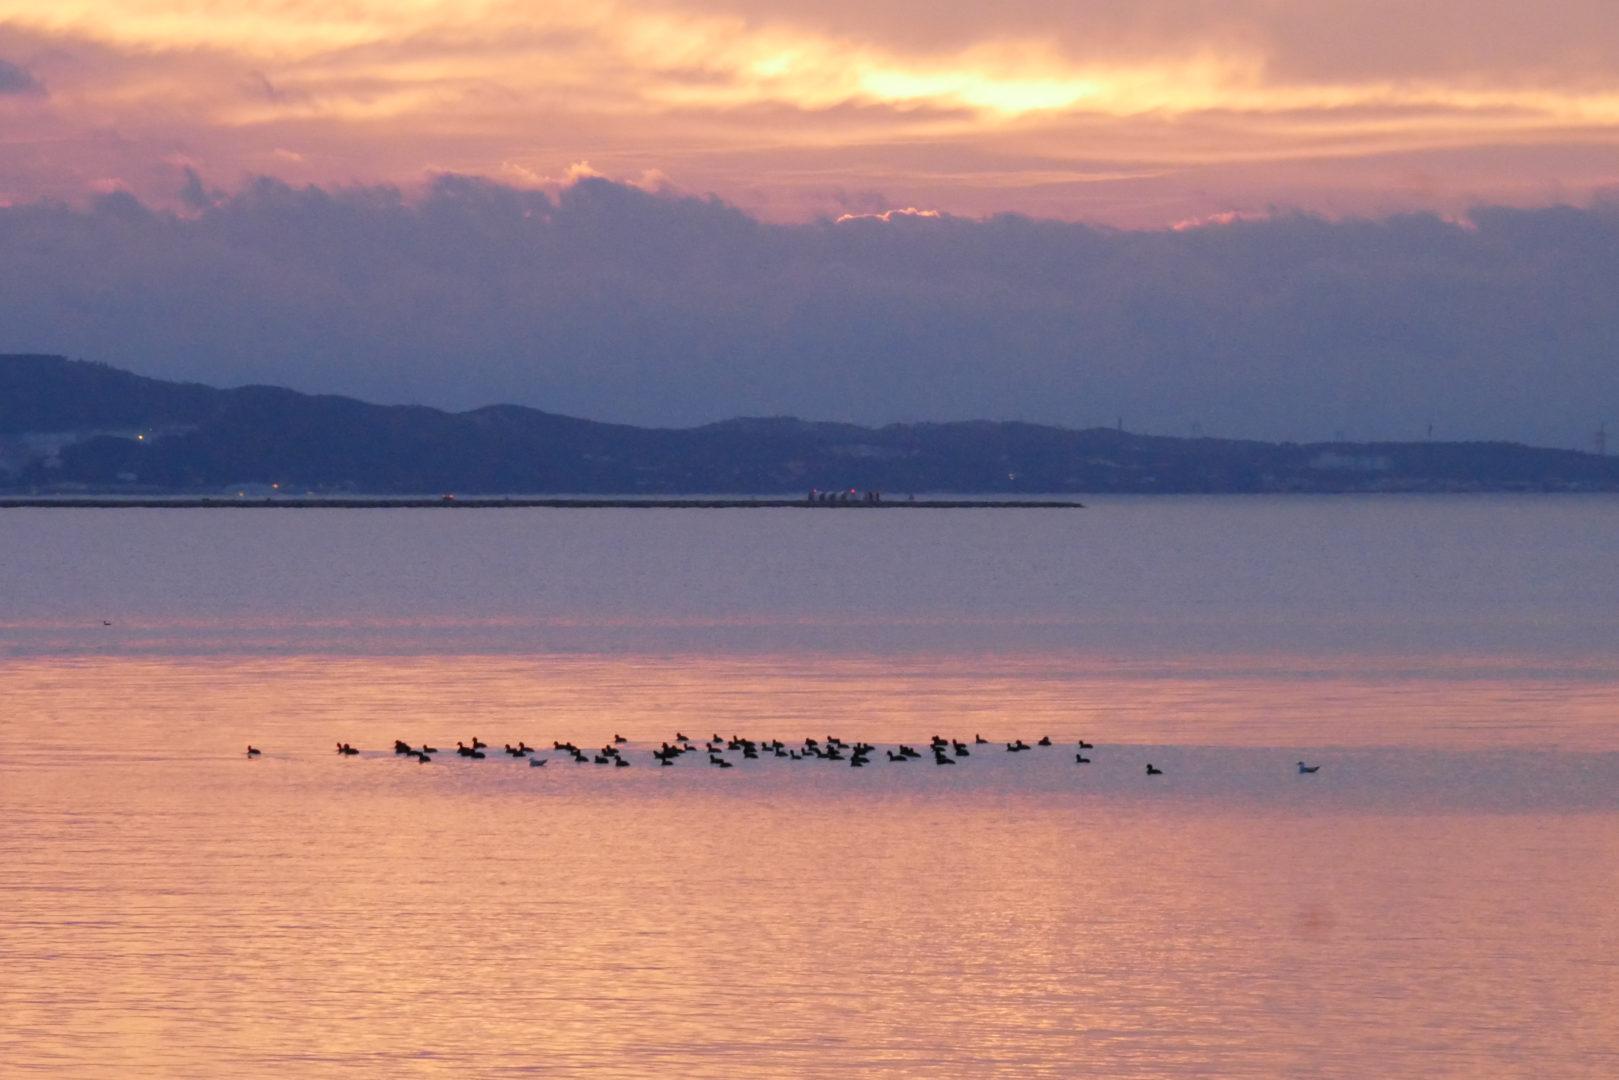 Lagune de Berre